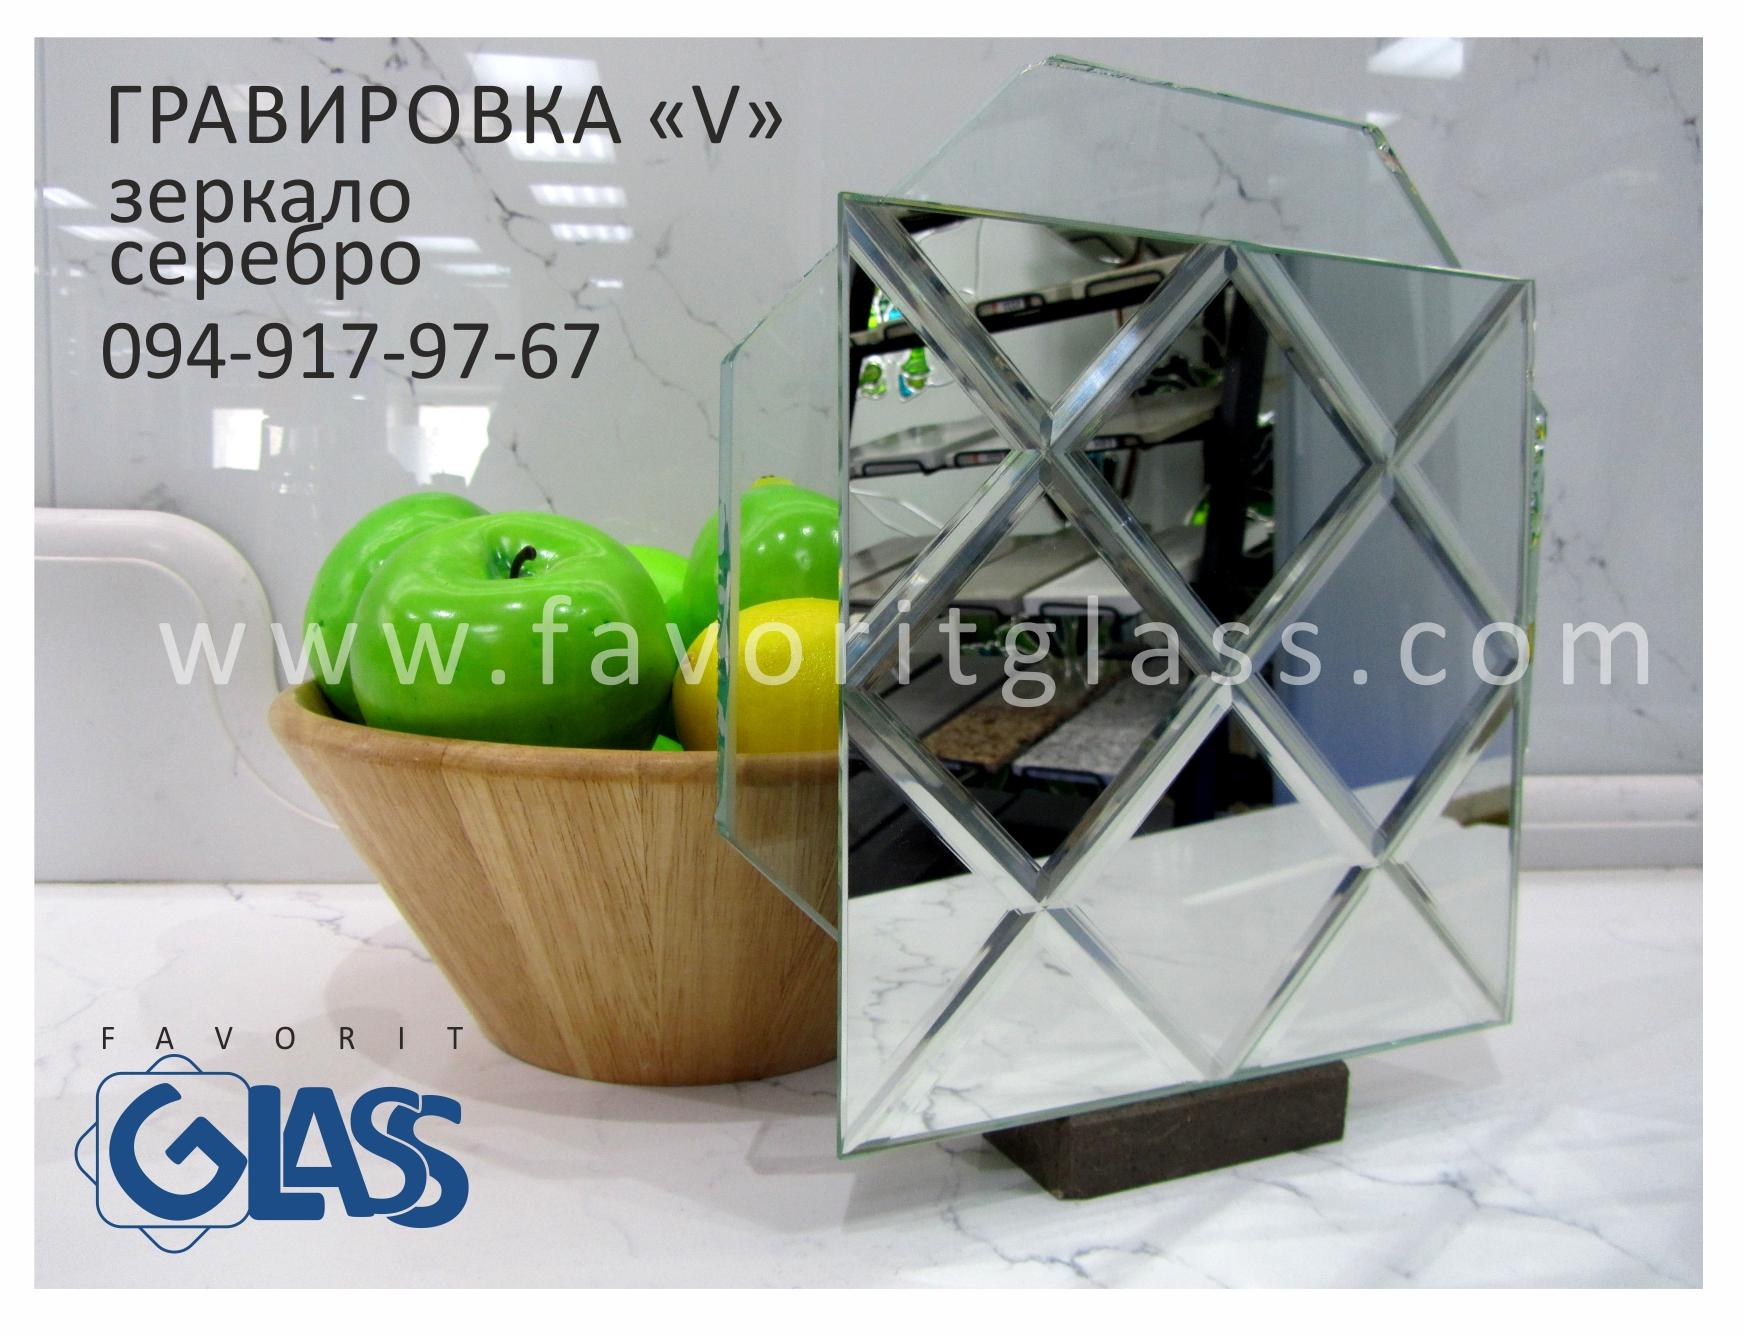 Алмазная Гравировка V на зеркале серебро